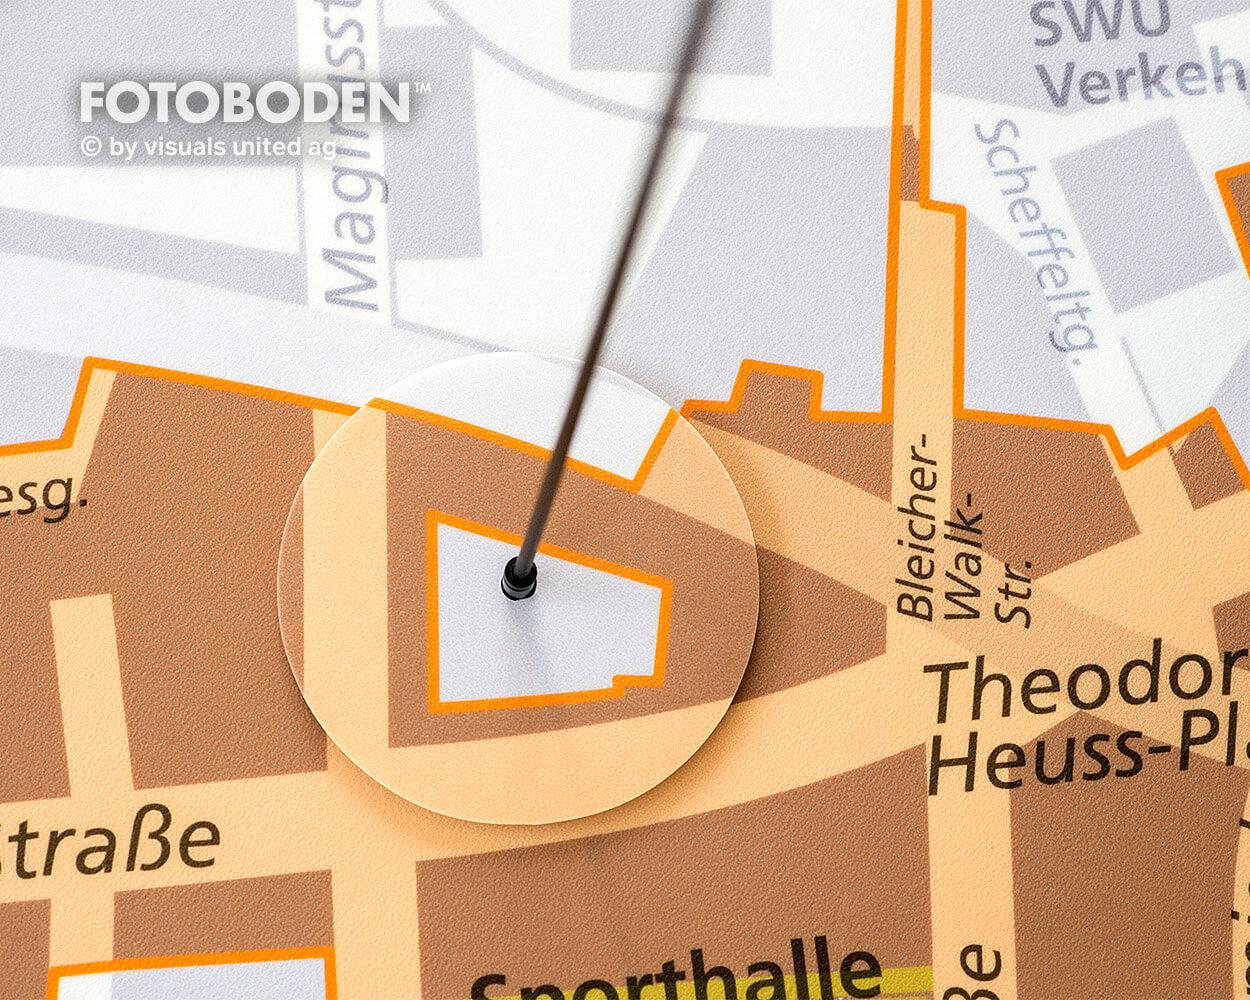 Sparkasse Ulm Ausstellung Museum  Raumkonzept Stimmung Museumsboden Ausstellungsboden Fotoboden Vinylboden Flooring Individuell Event4